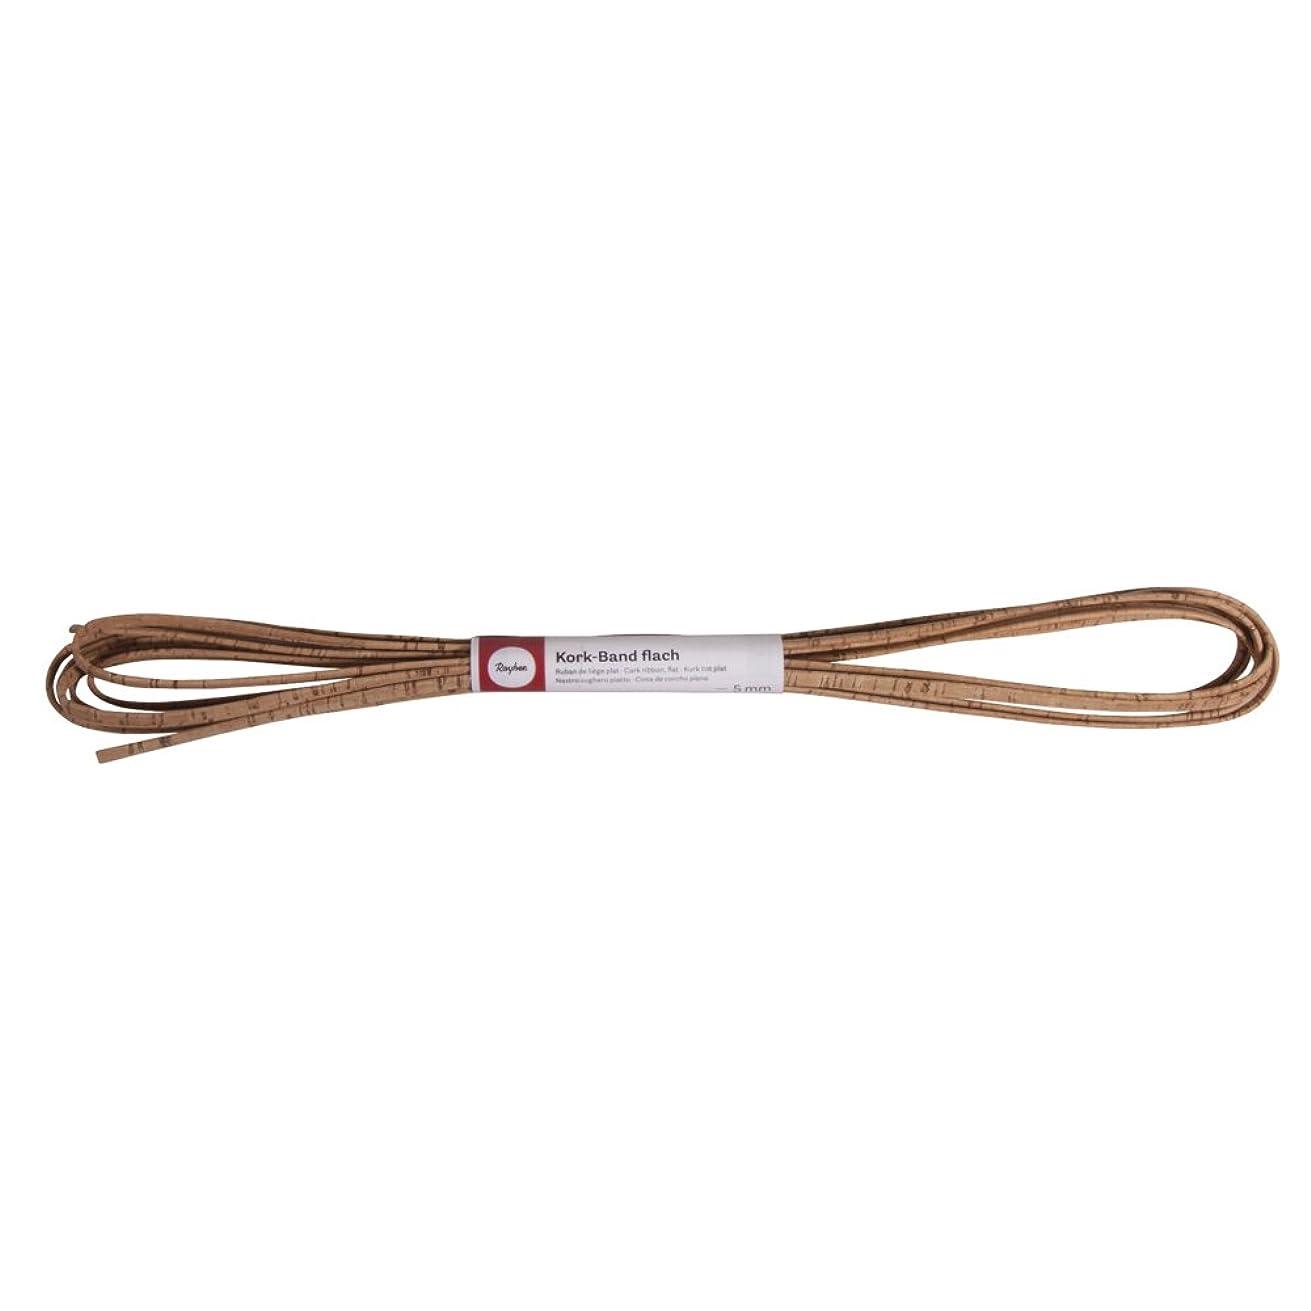 RAYHER Cork Cork Tape Bundle of Flat 3?mm?–?5?m, Cork, Natural, 35.5 x 5.5 x 4.5 cm